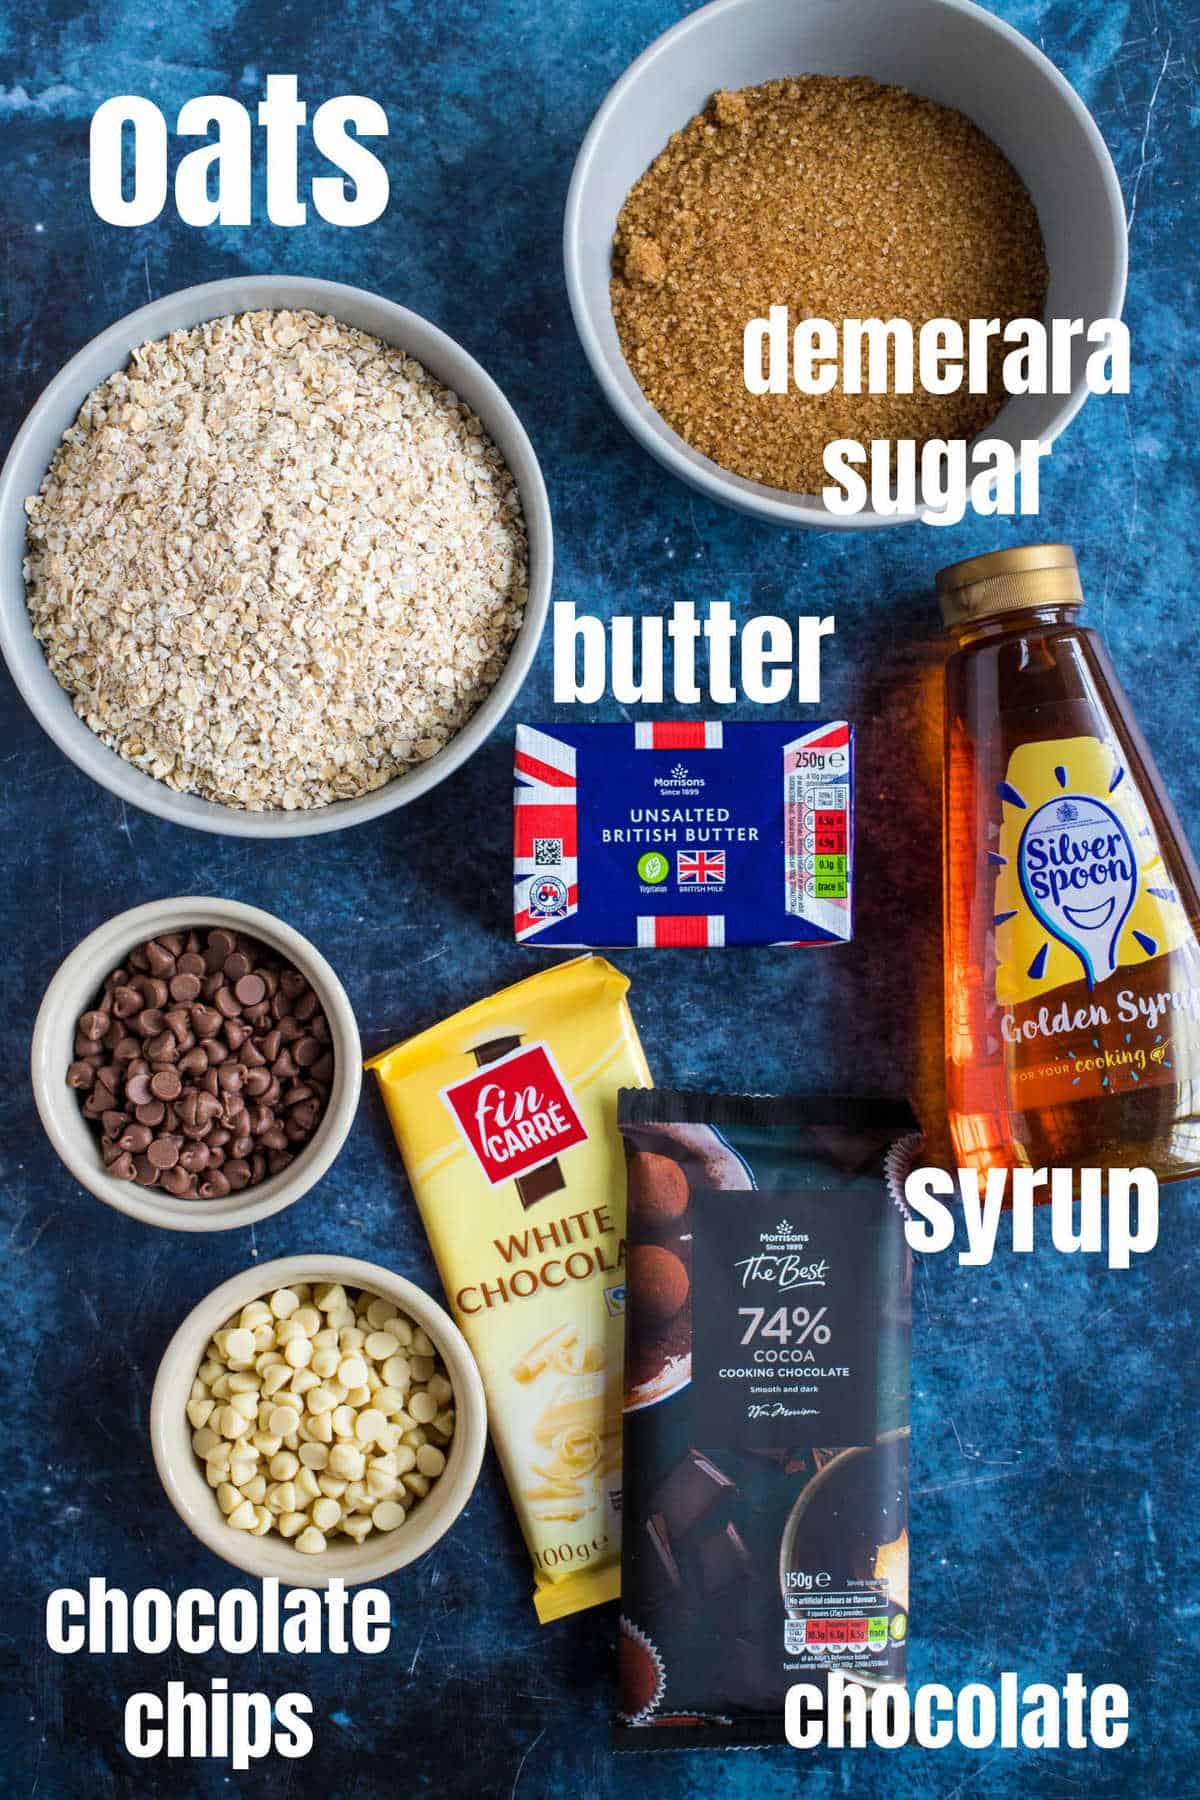 Ingredients needed to make chocolate chip flapjacks.